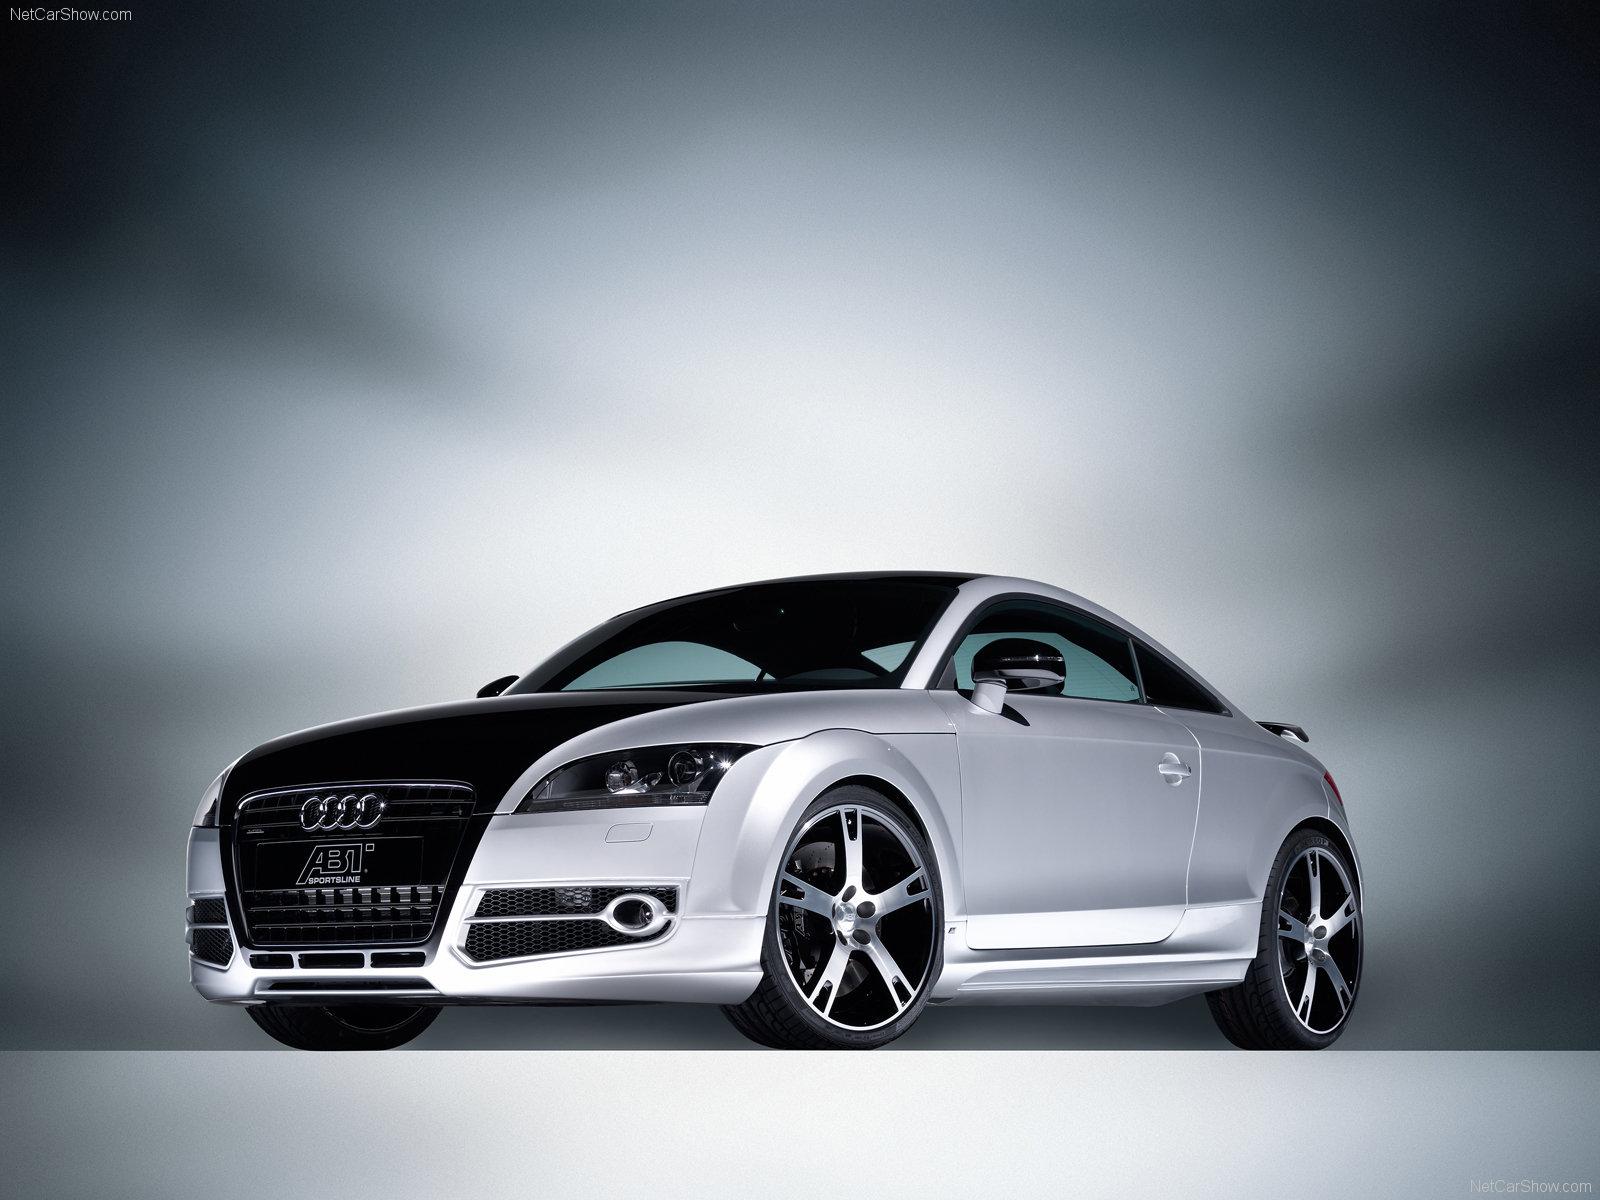 http://4.bp.blogspot.com/-_NudkaA624A/T1Im41F9_qI/AAAAAAAAAcM/Yoxx1XGs2Is/s1600/ABT-Audi_TT-R_2007_1600x1200_wallpaper_01.jpg